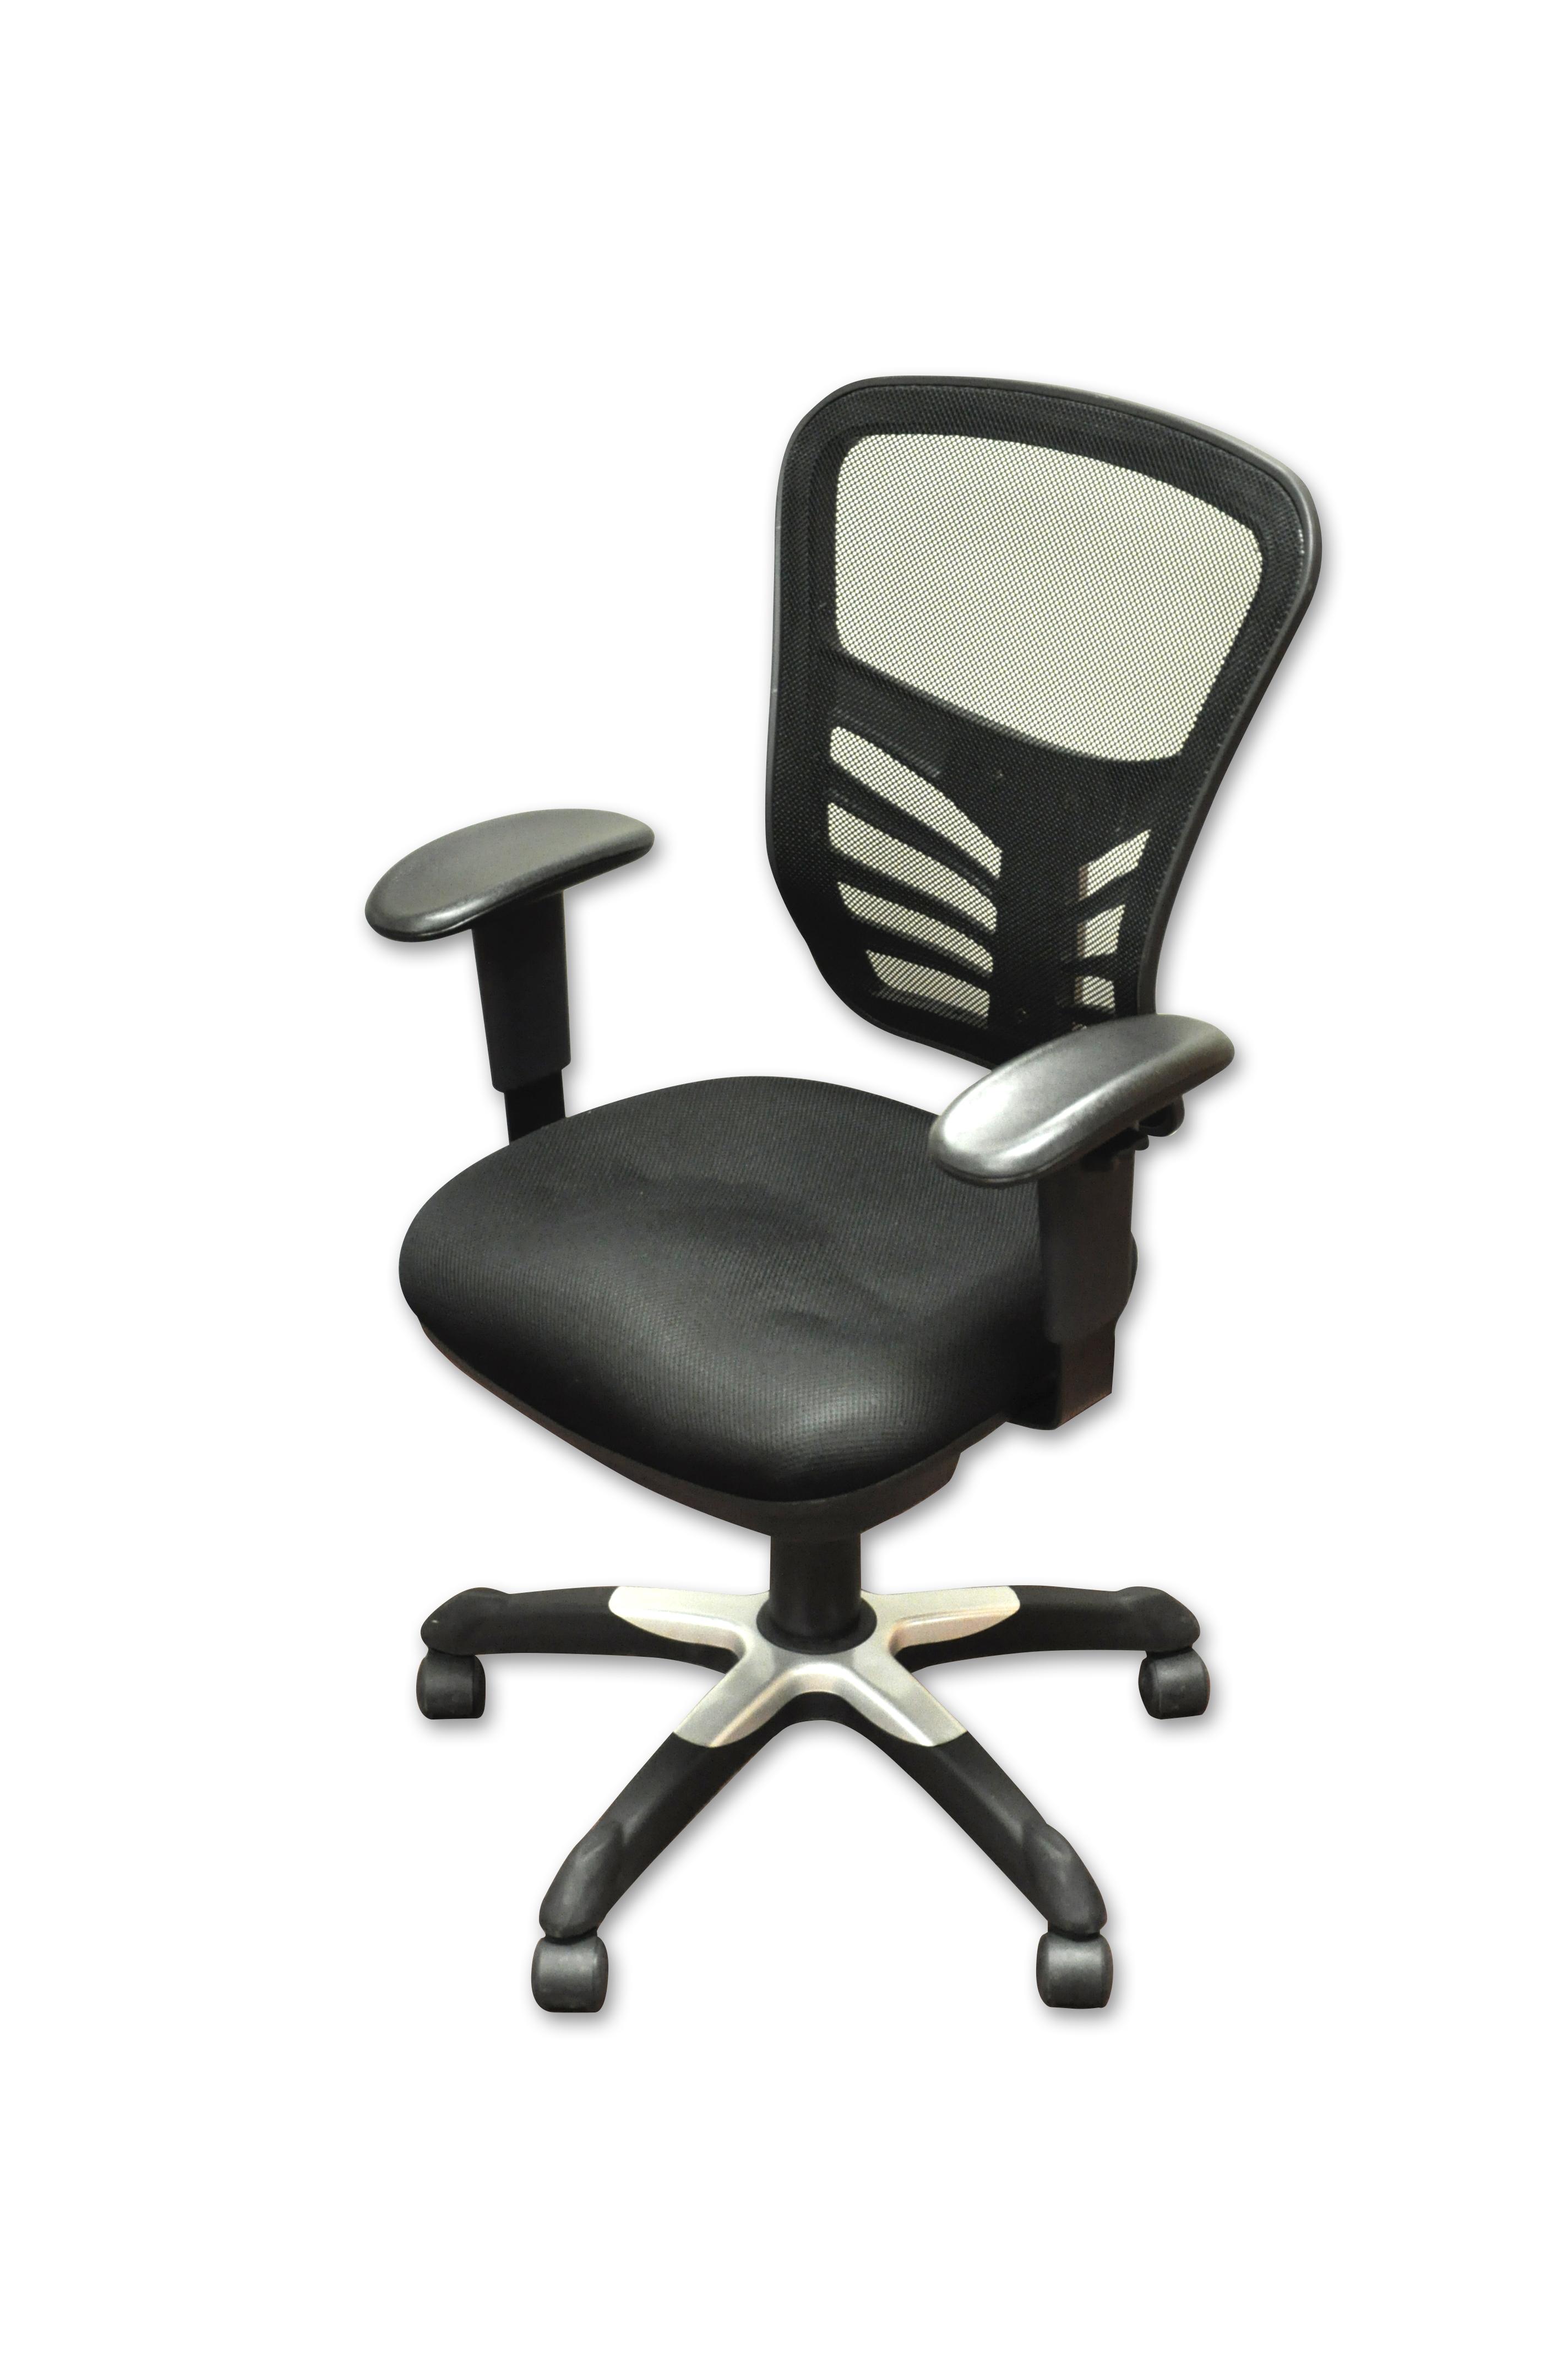 Ergonomic Office Chairs Minneapolis Milwaukee Podany 39 S